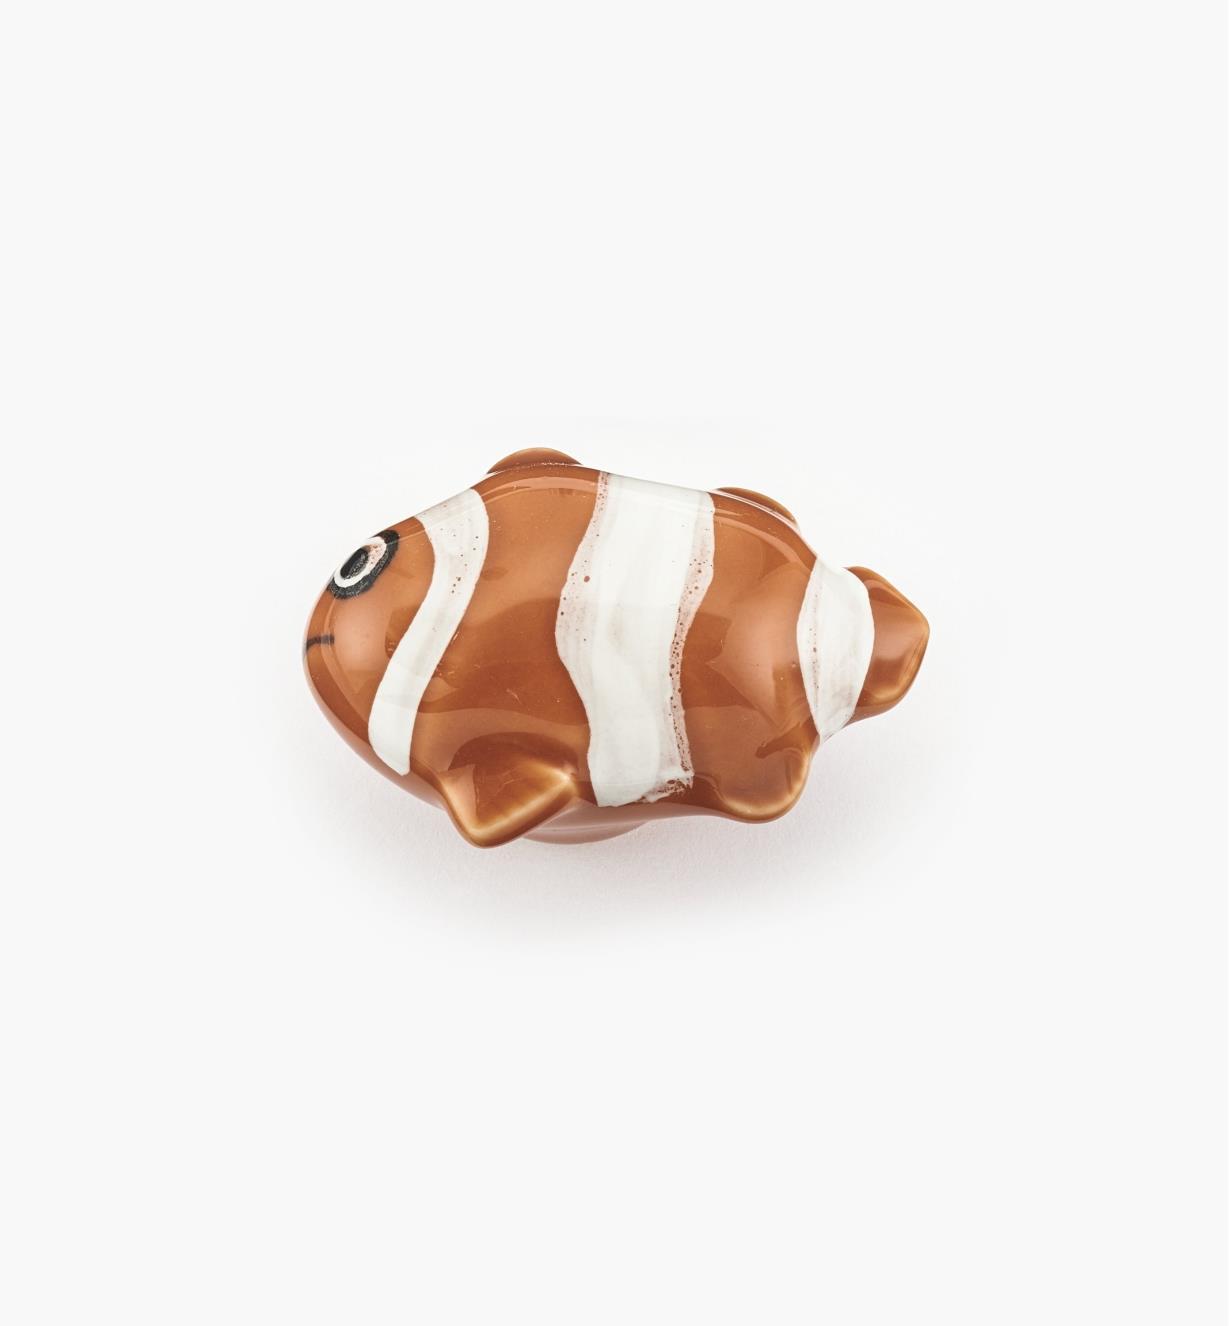 00W5320 - Bouton poisson-clown, 2 po x 1 1/2 po, l'unité